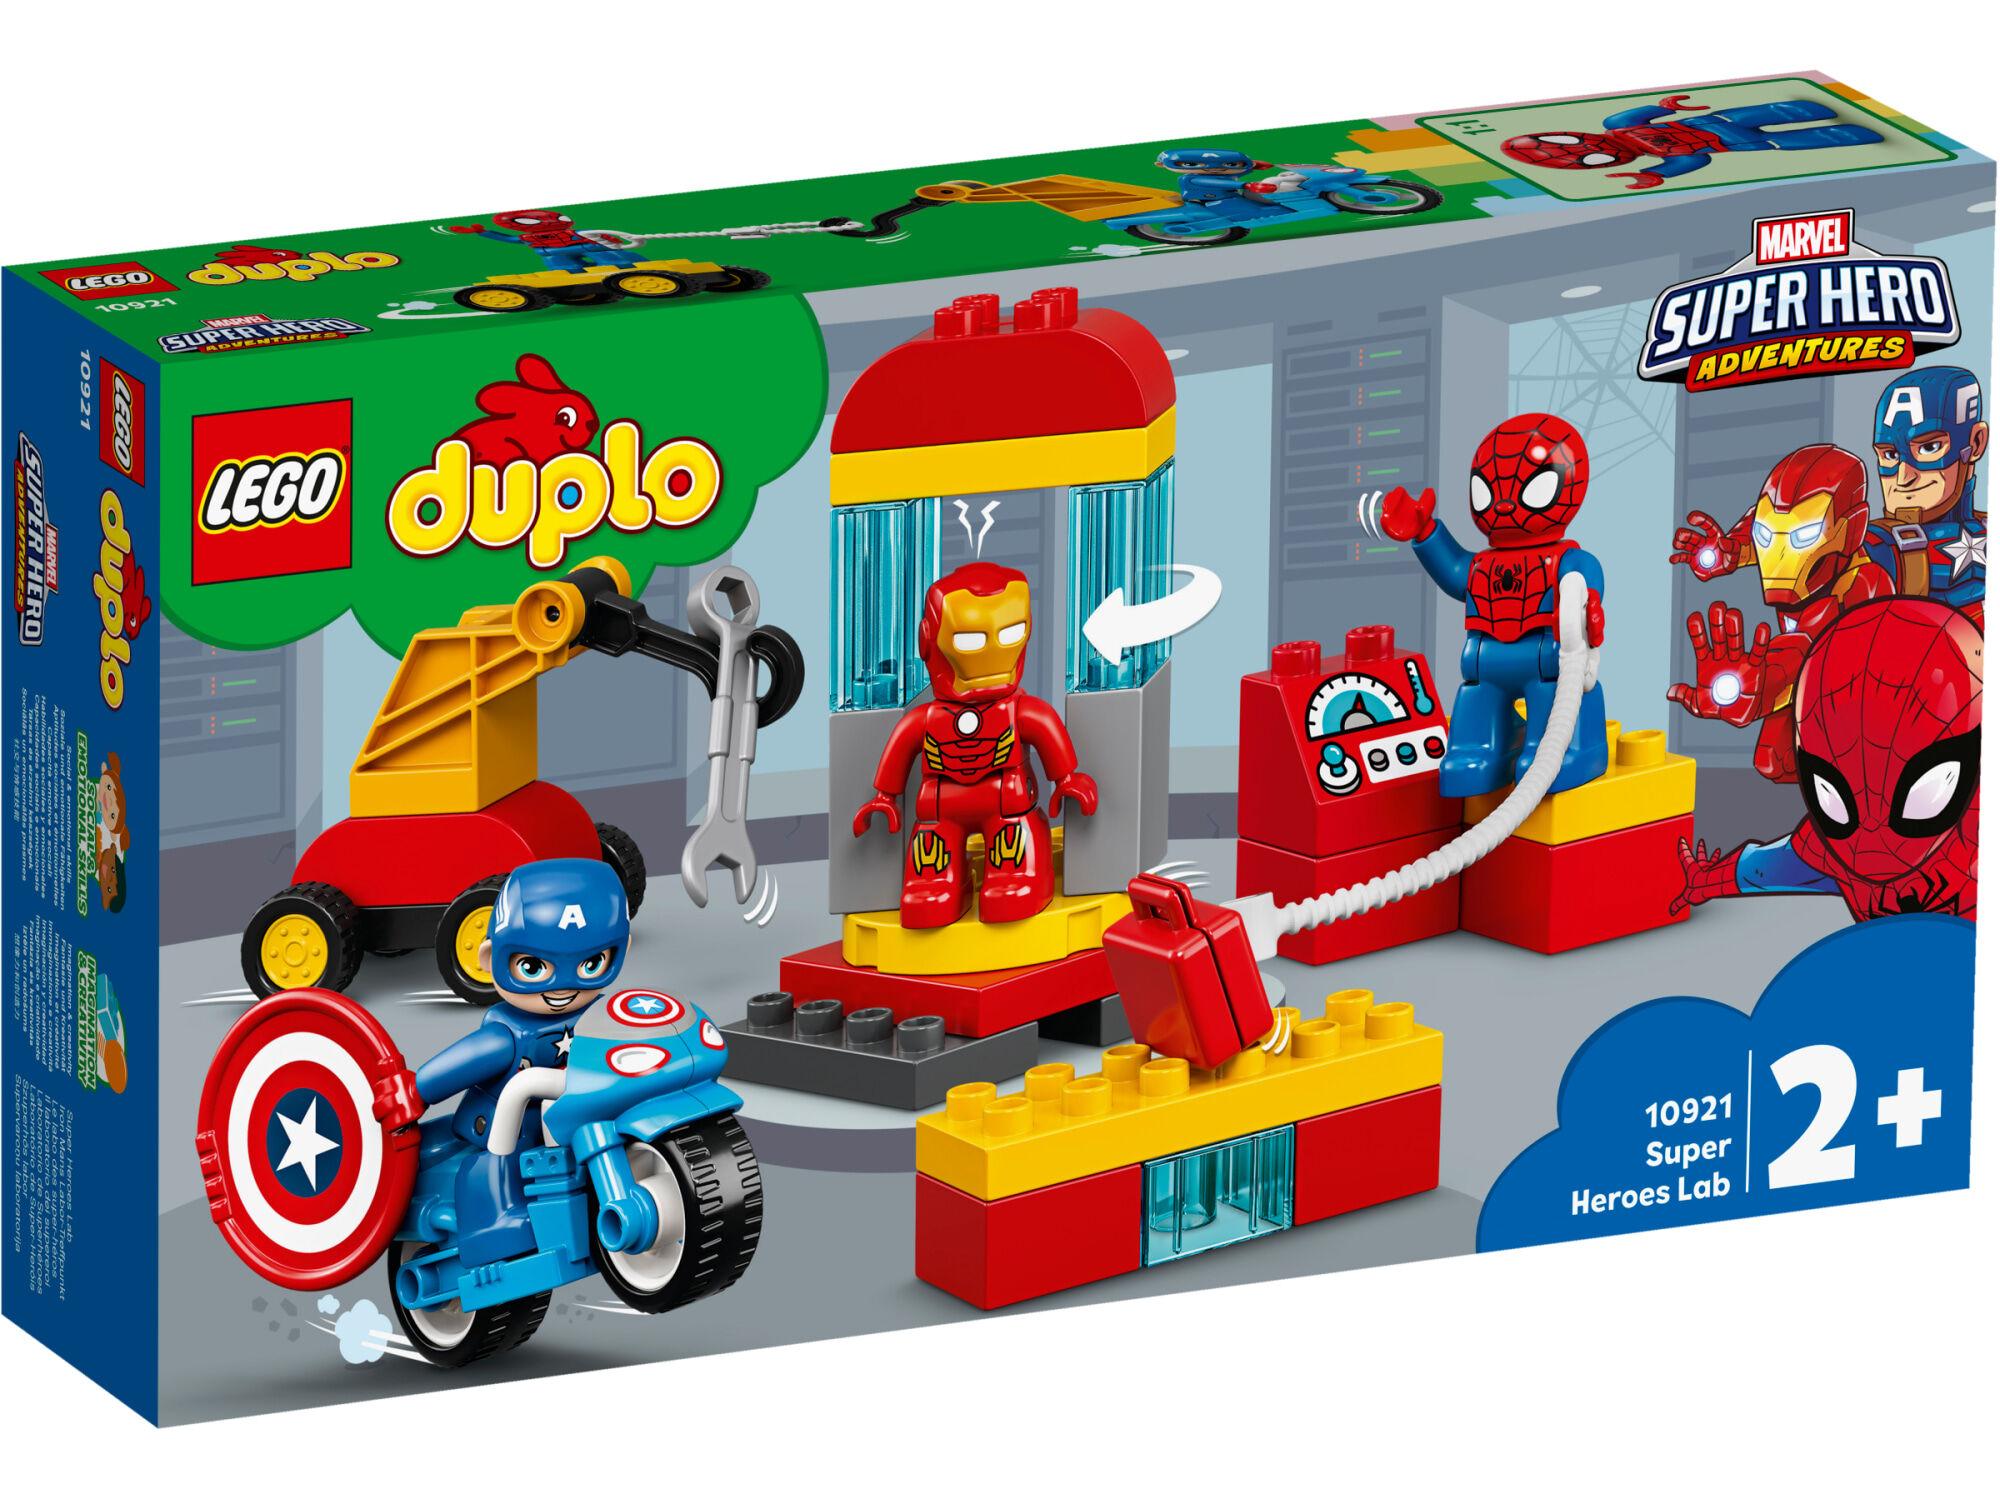 Lego DUPLO Super Heroes 10921 Supersankarien laboratorio